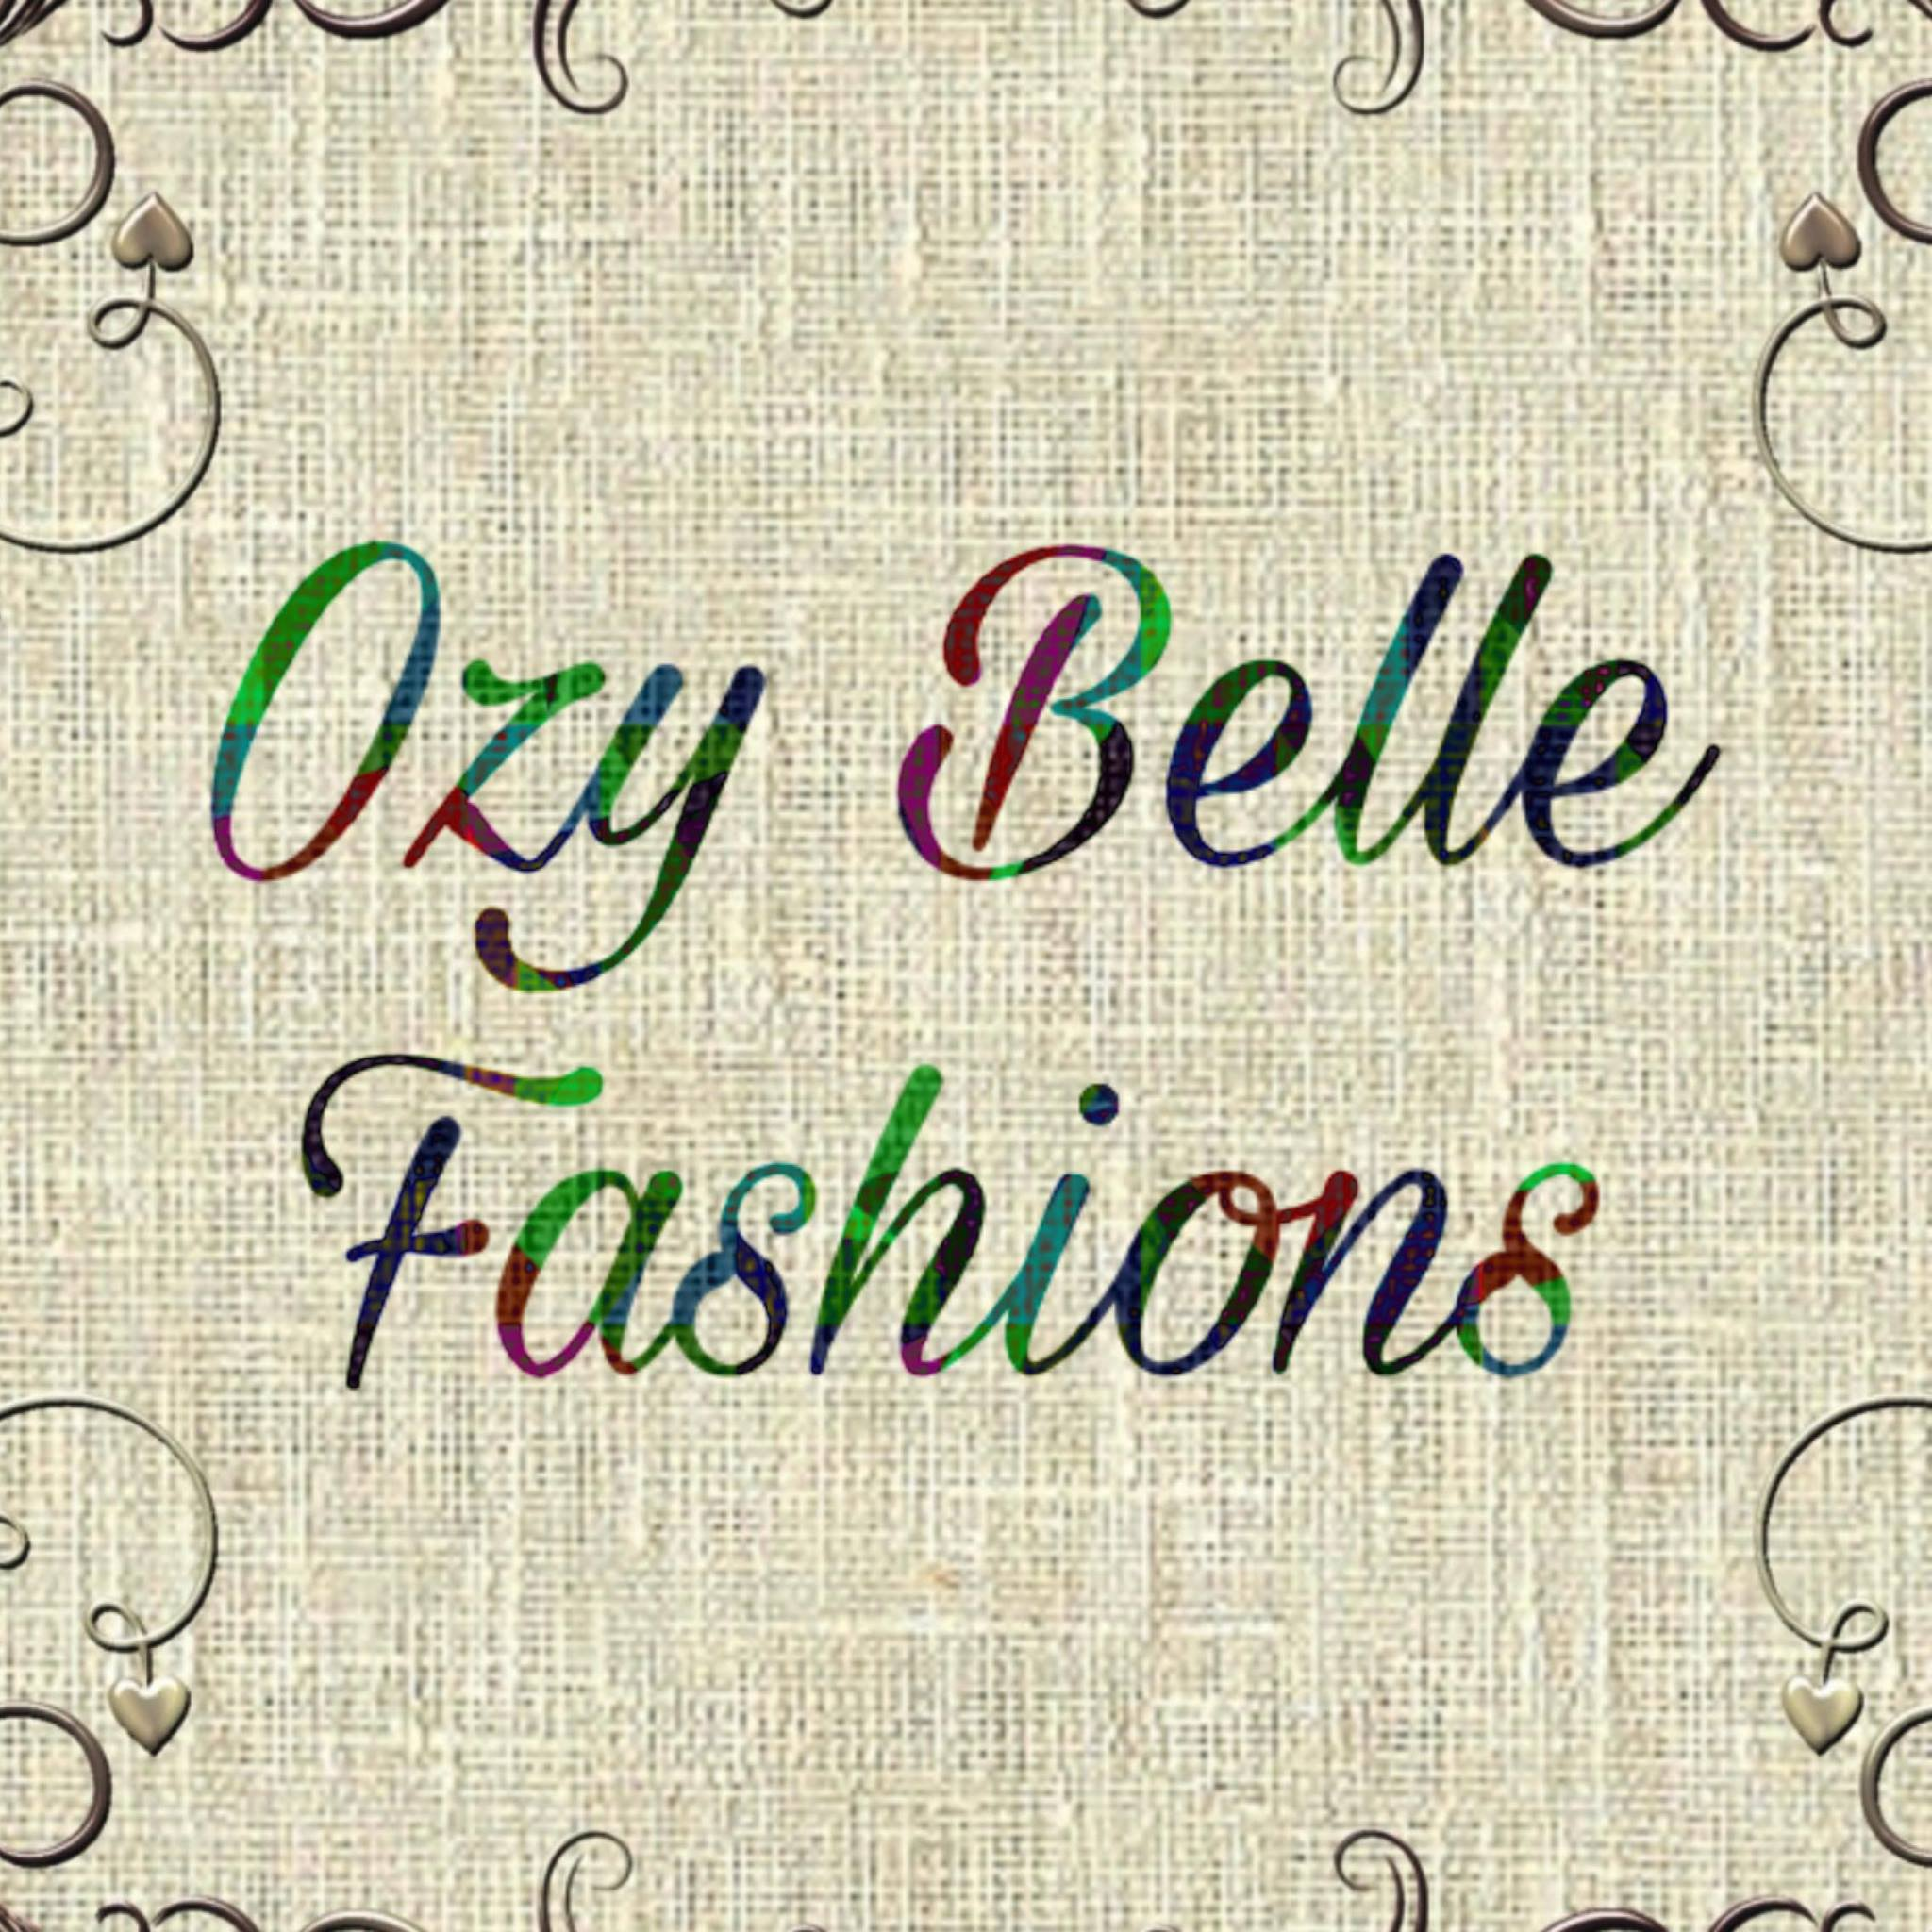 Ozy Belle Fashion